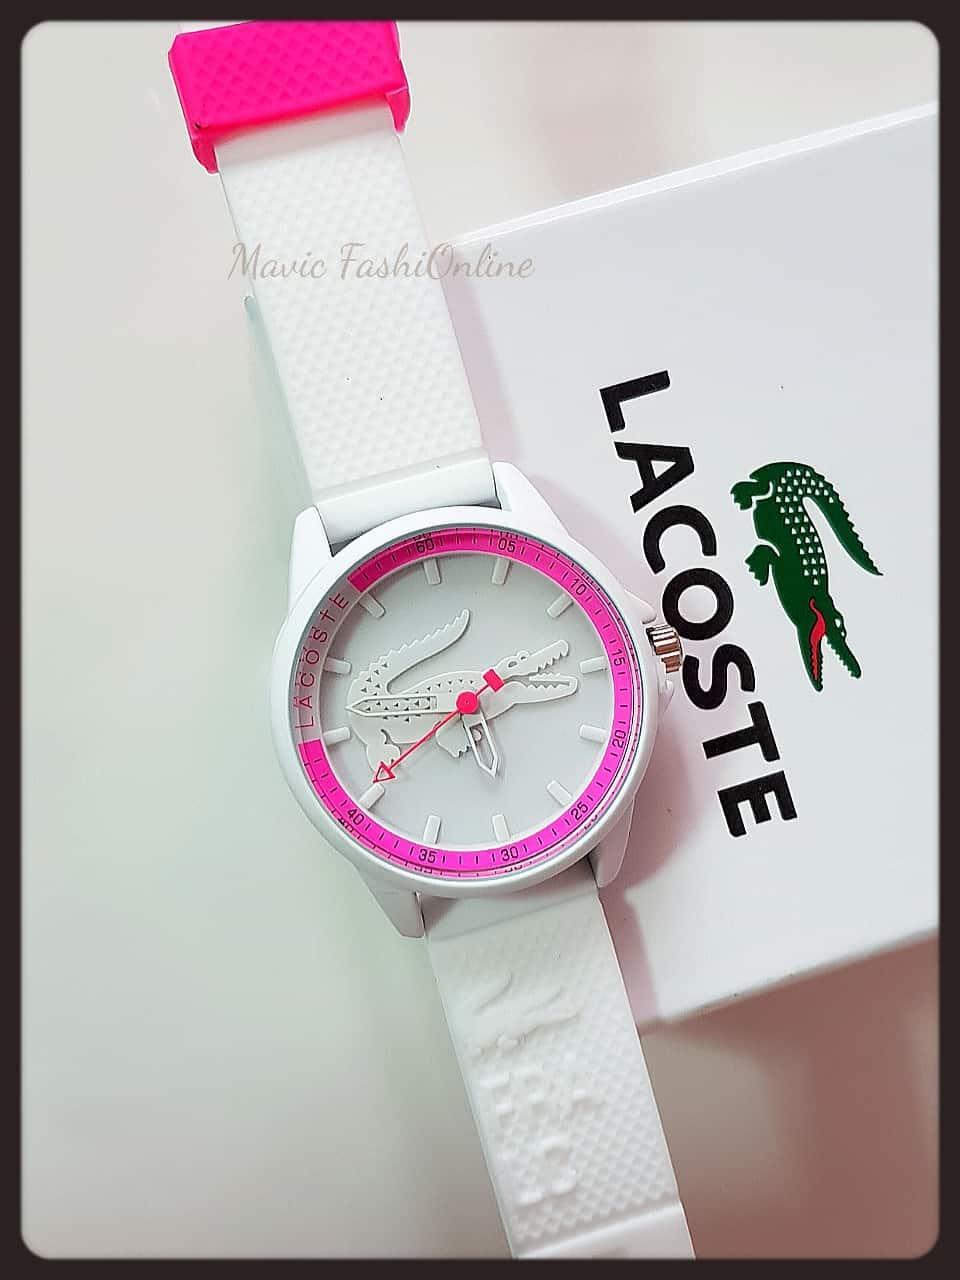 9651d82c16 SALE! Authentic Quality Lacoste Neon Fashion Trendy Watches